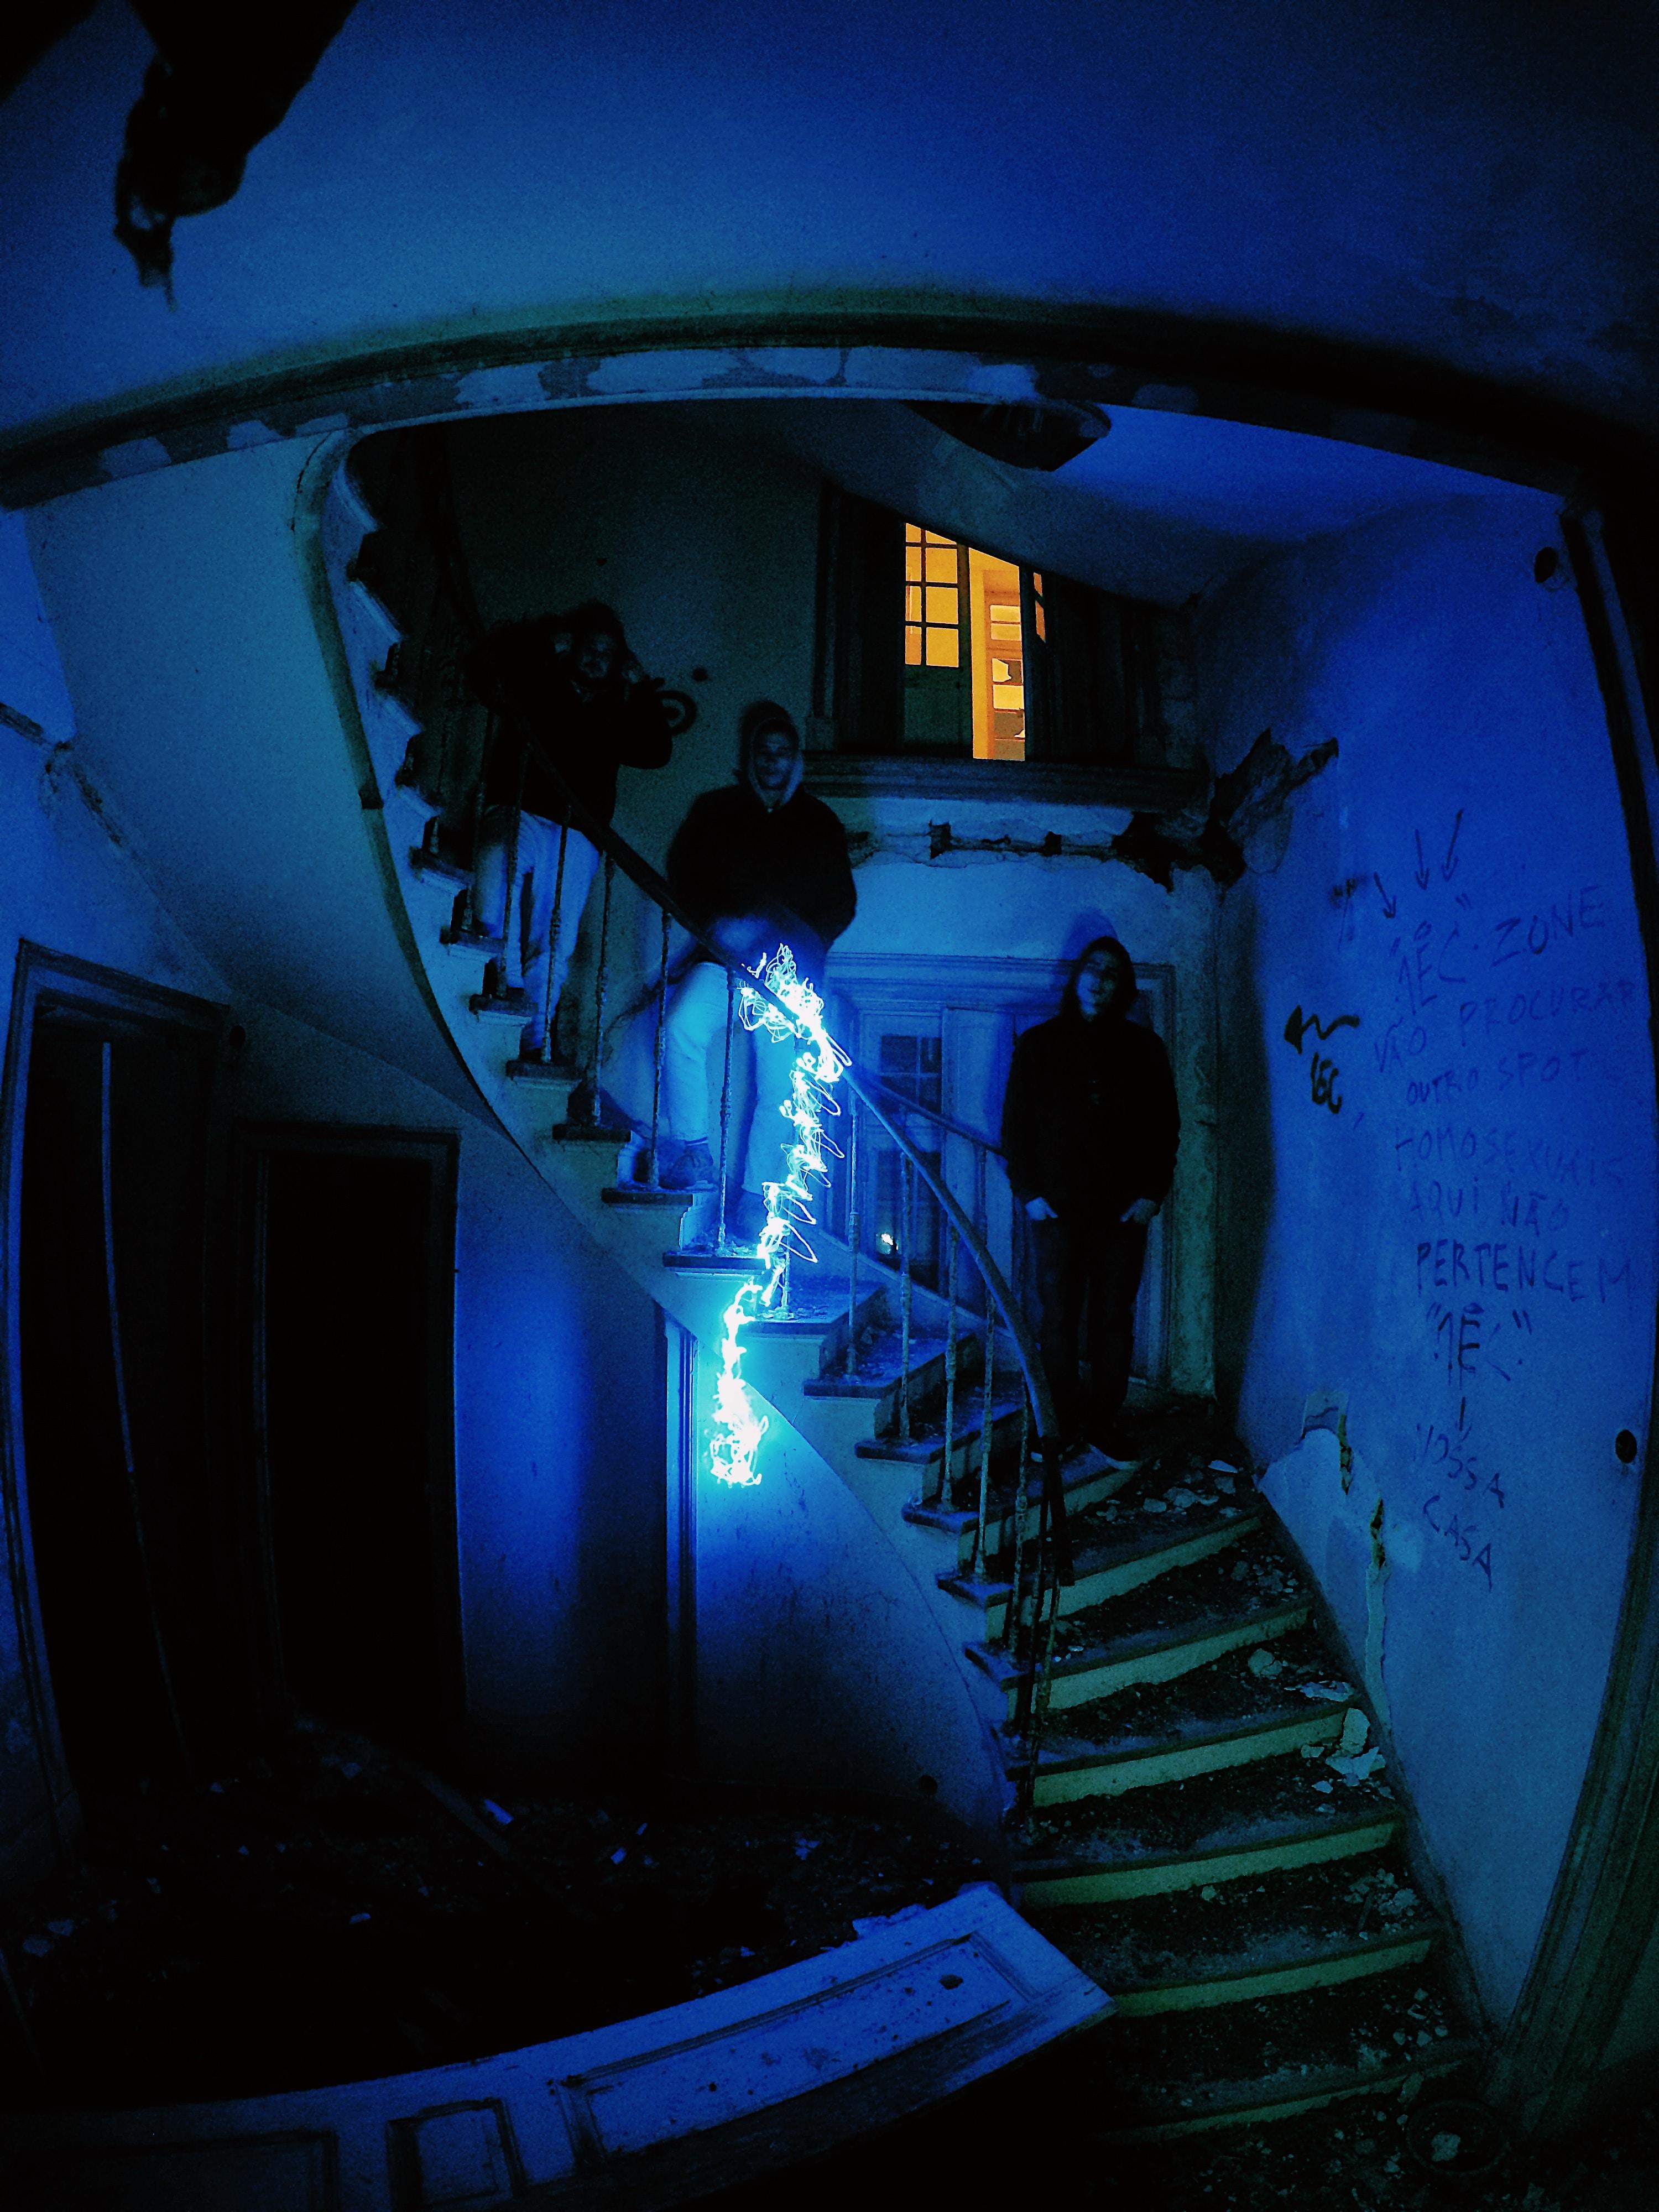 3 men standing on stairway